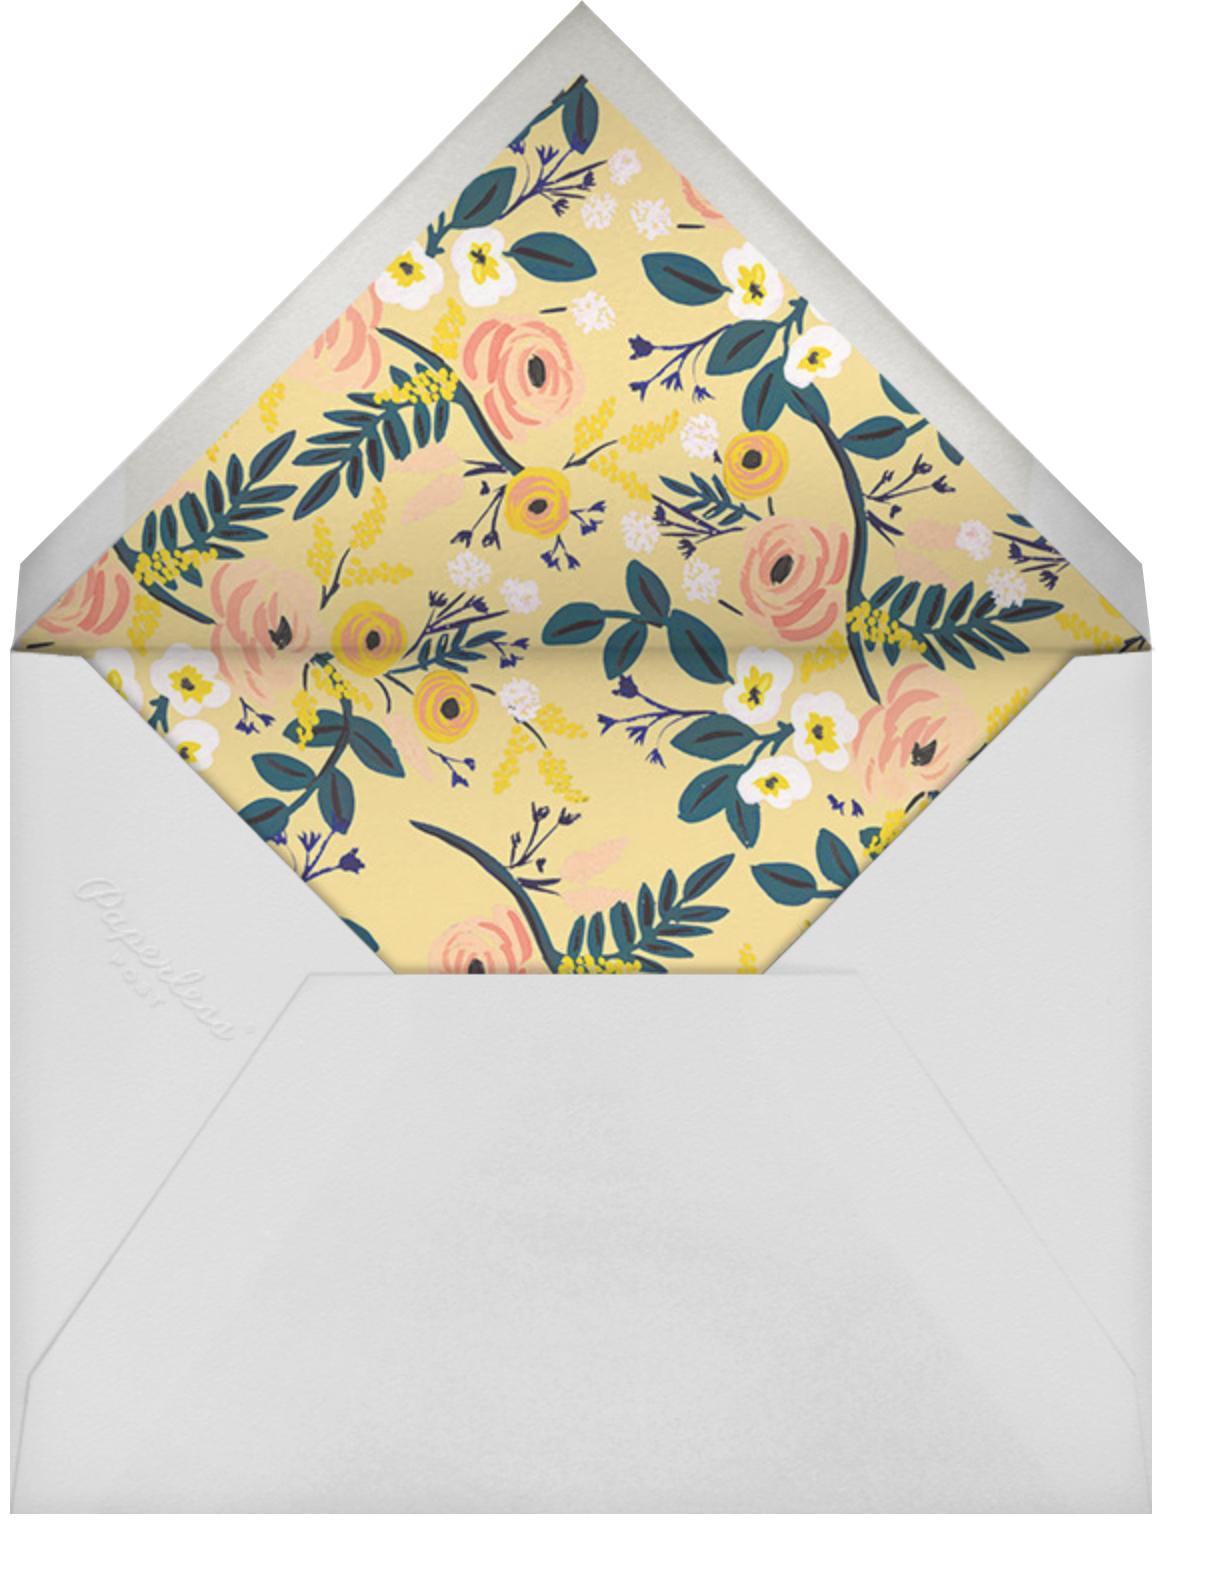 Cloche - Deep - Rifle Paper Co. - Cocktail party - envelope back